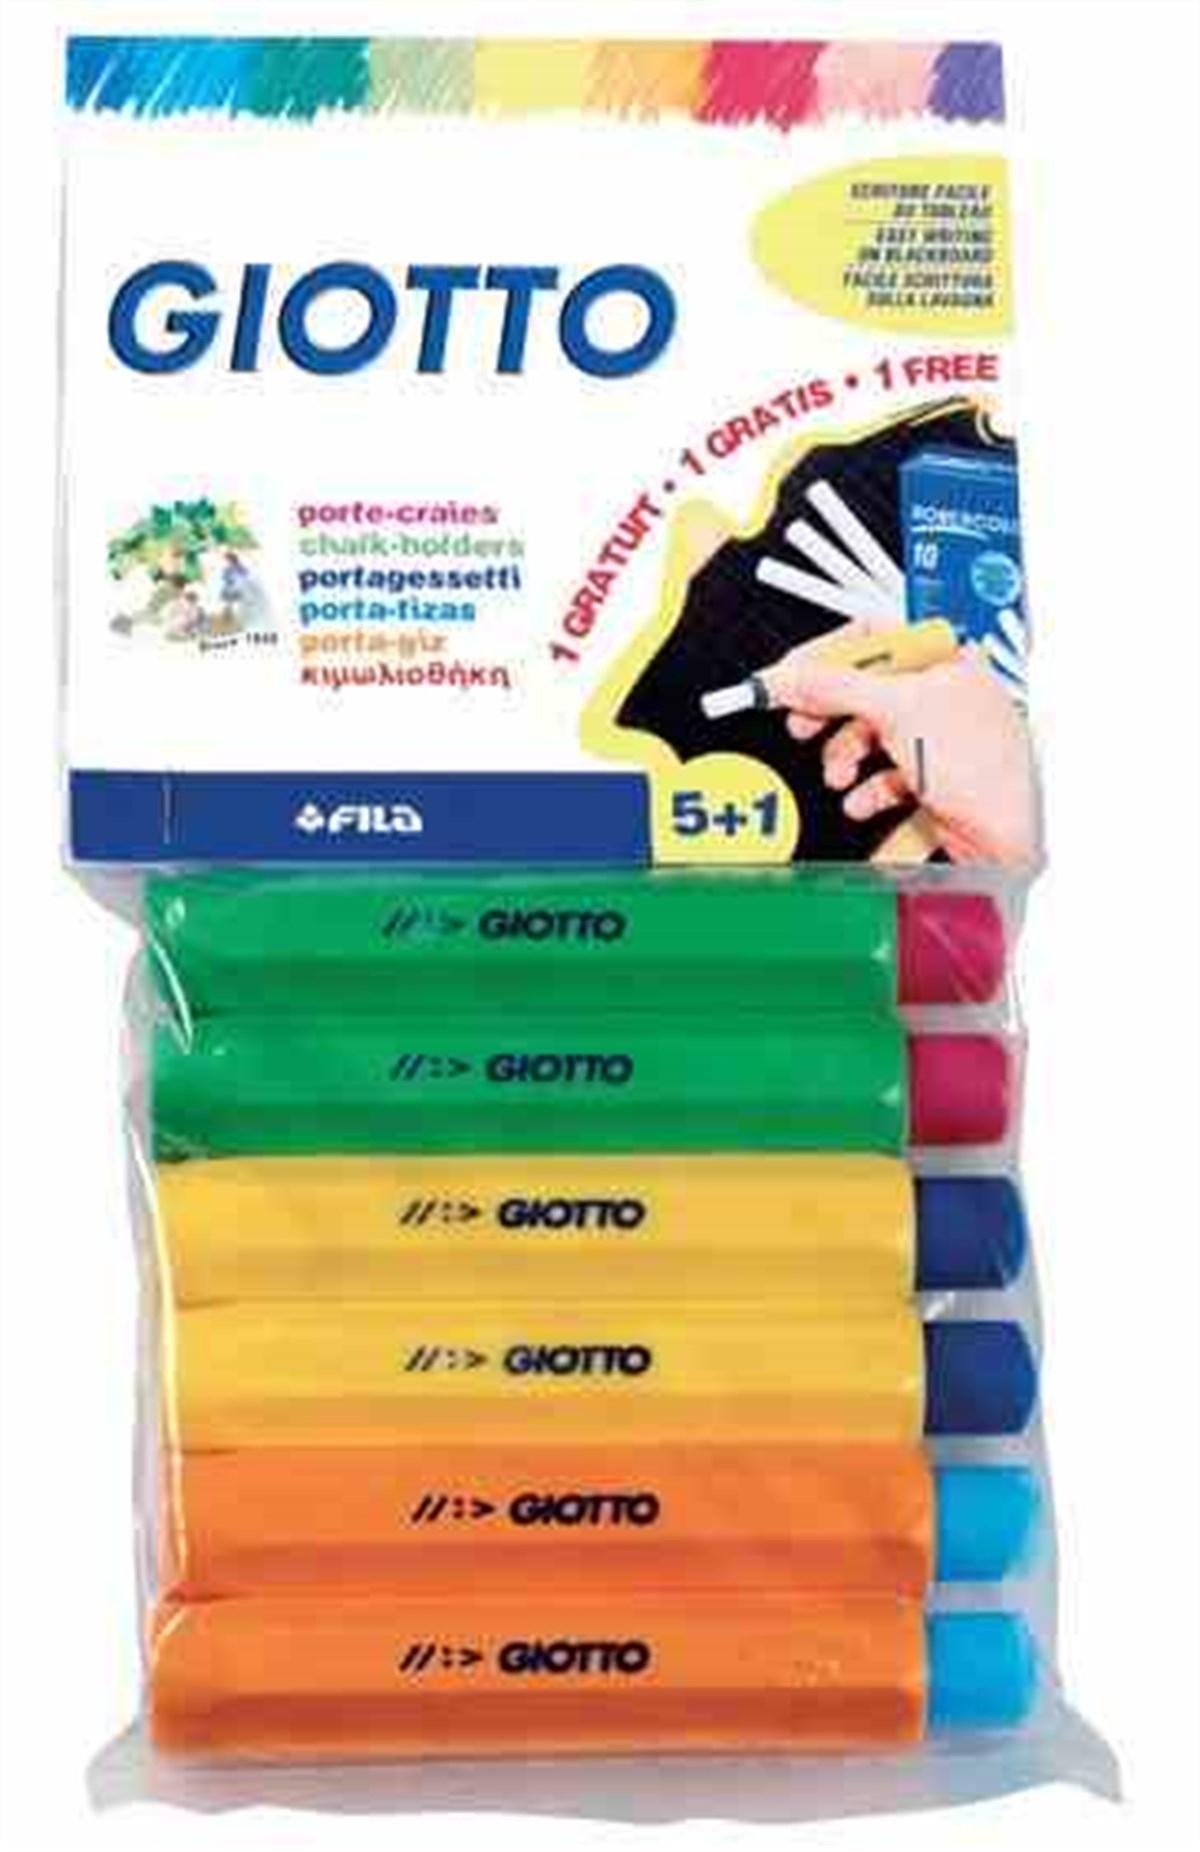 Giotto Tebeşir Tutacaği Plastik 5+1 692300 intérieur Paper Toy Gratuit